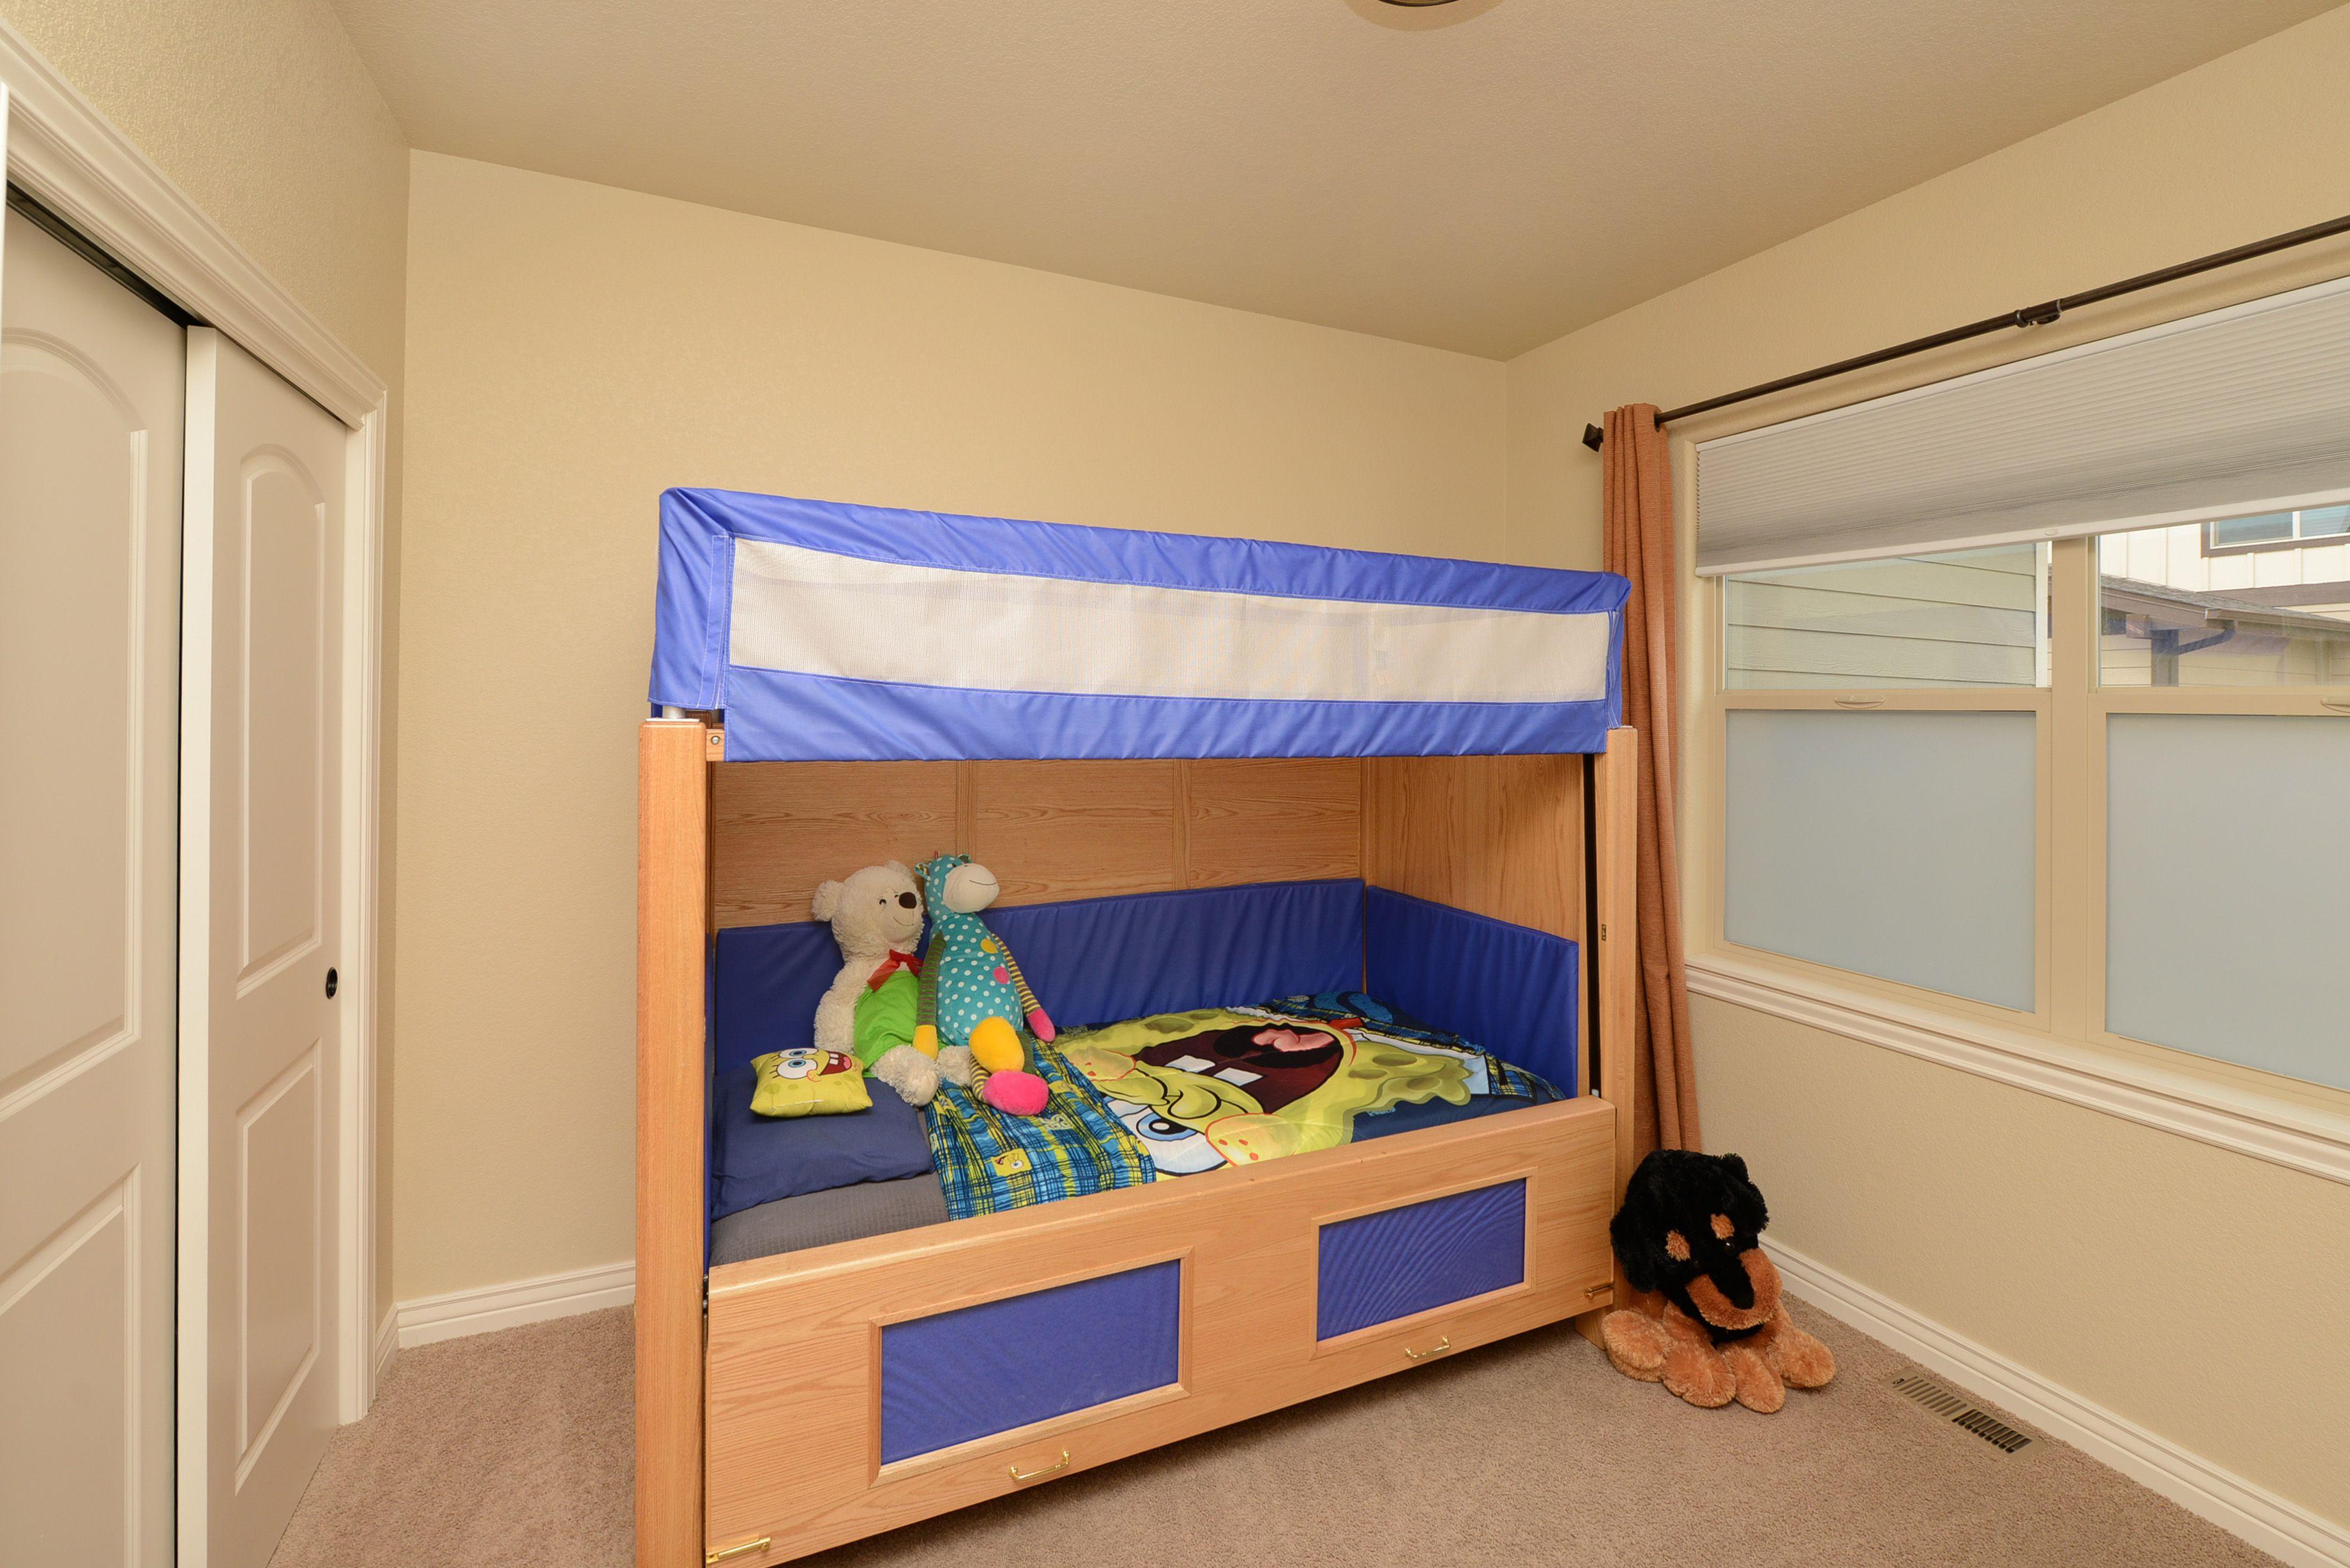 Hi Side Slumber Series bed with matching interior padding